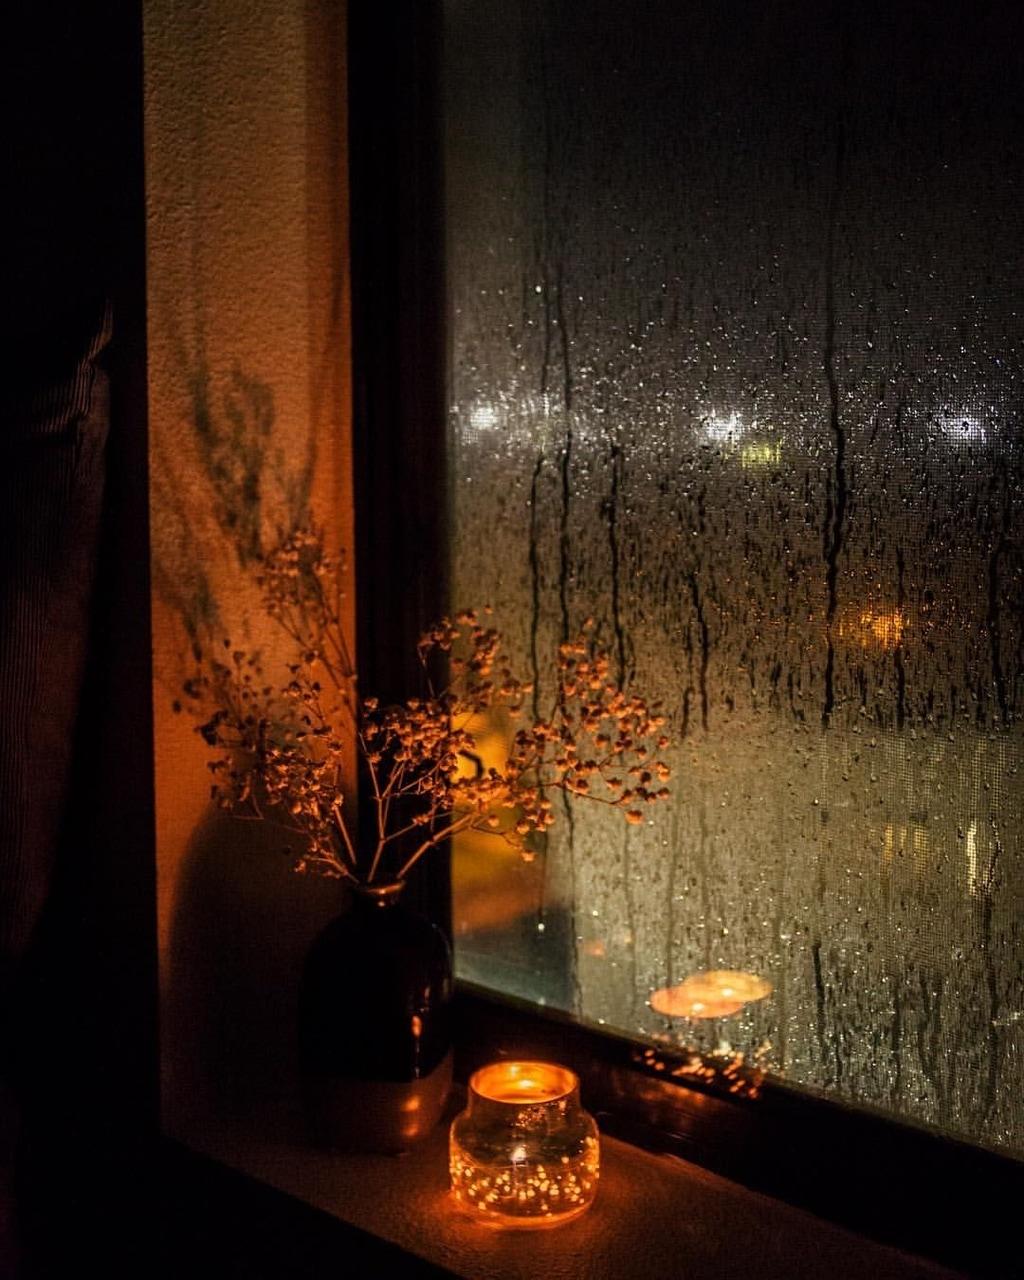 rain, window, and candle image